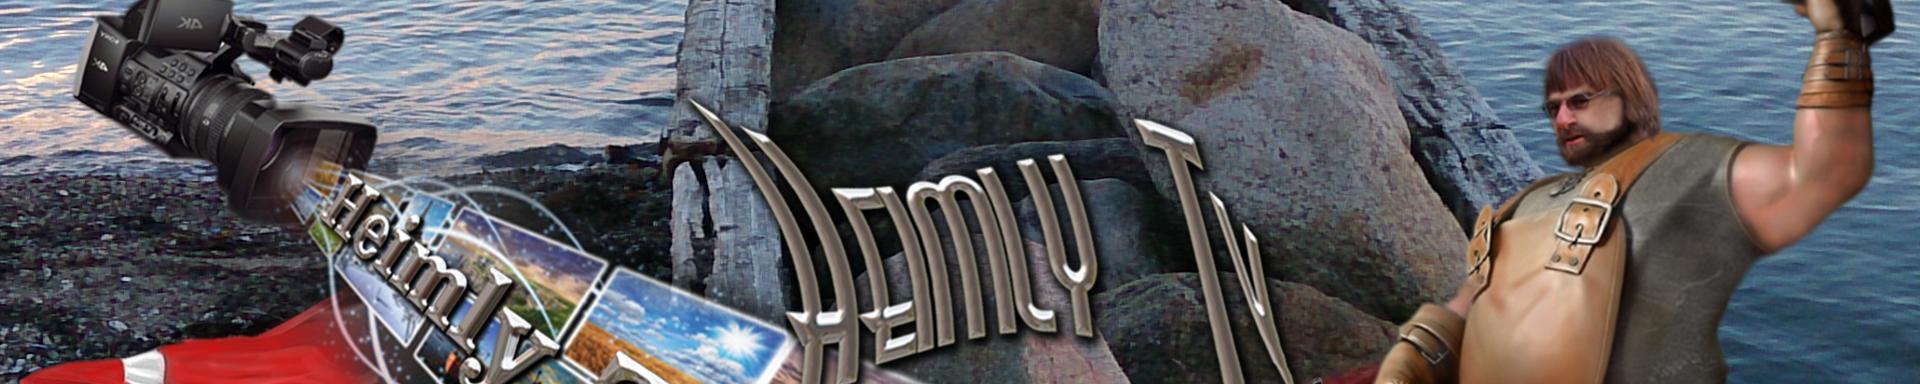 Heimly Net